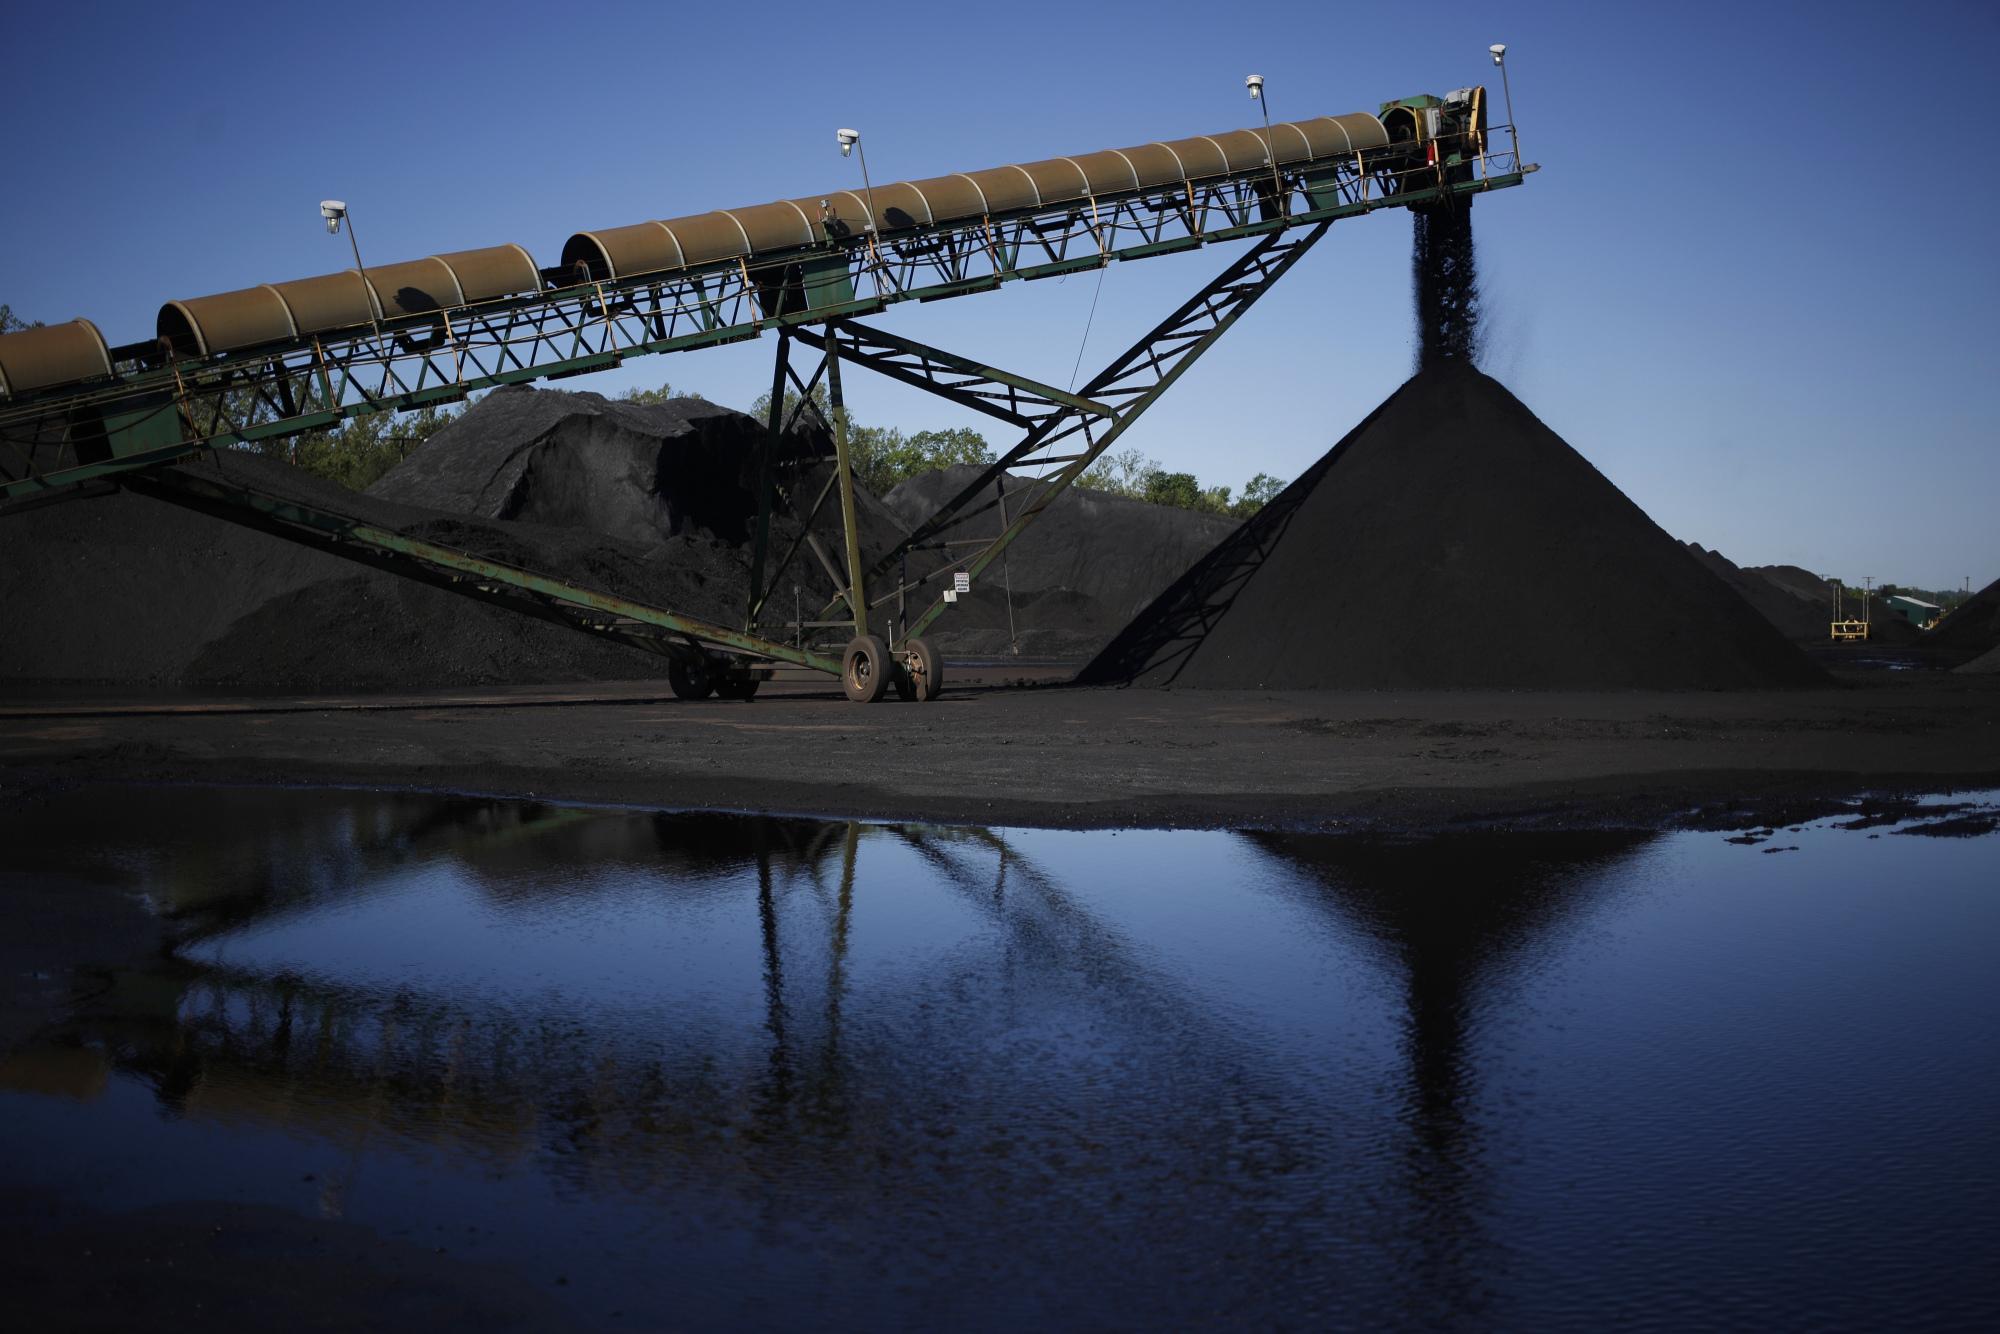 Blackhawk Files Chapter 11, Joins List of Bankrupt Coal